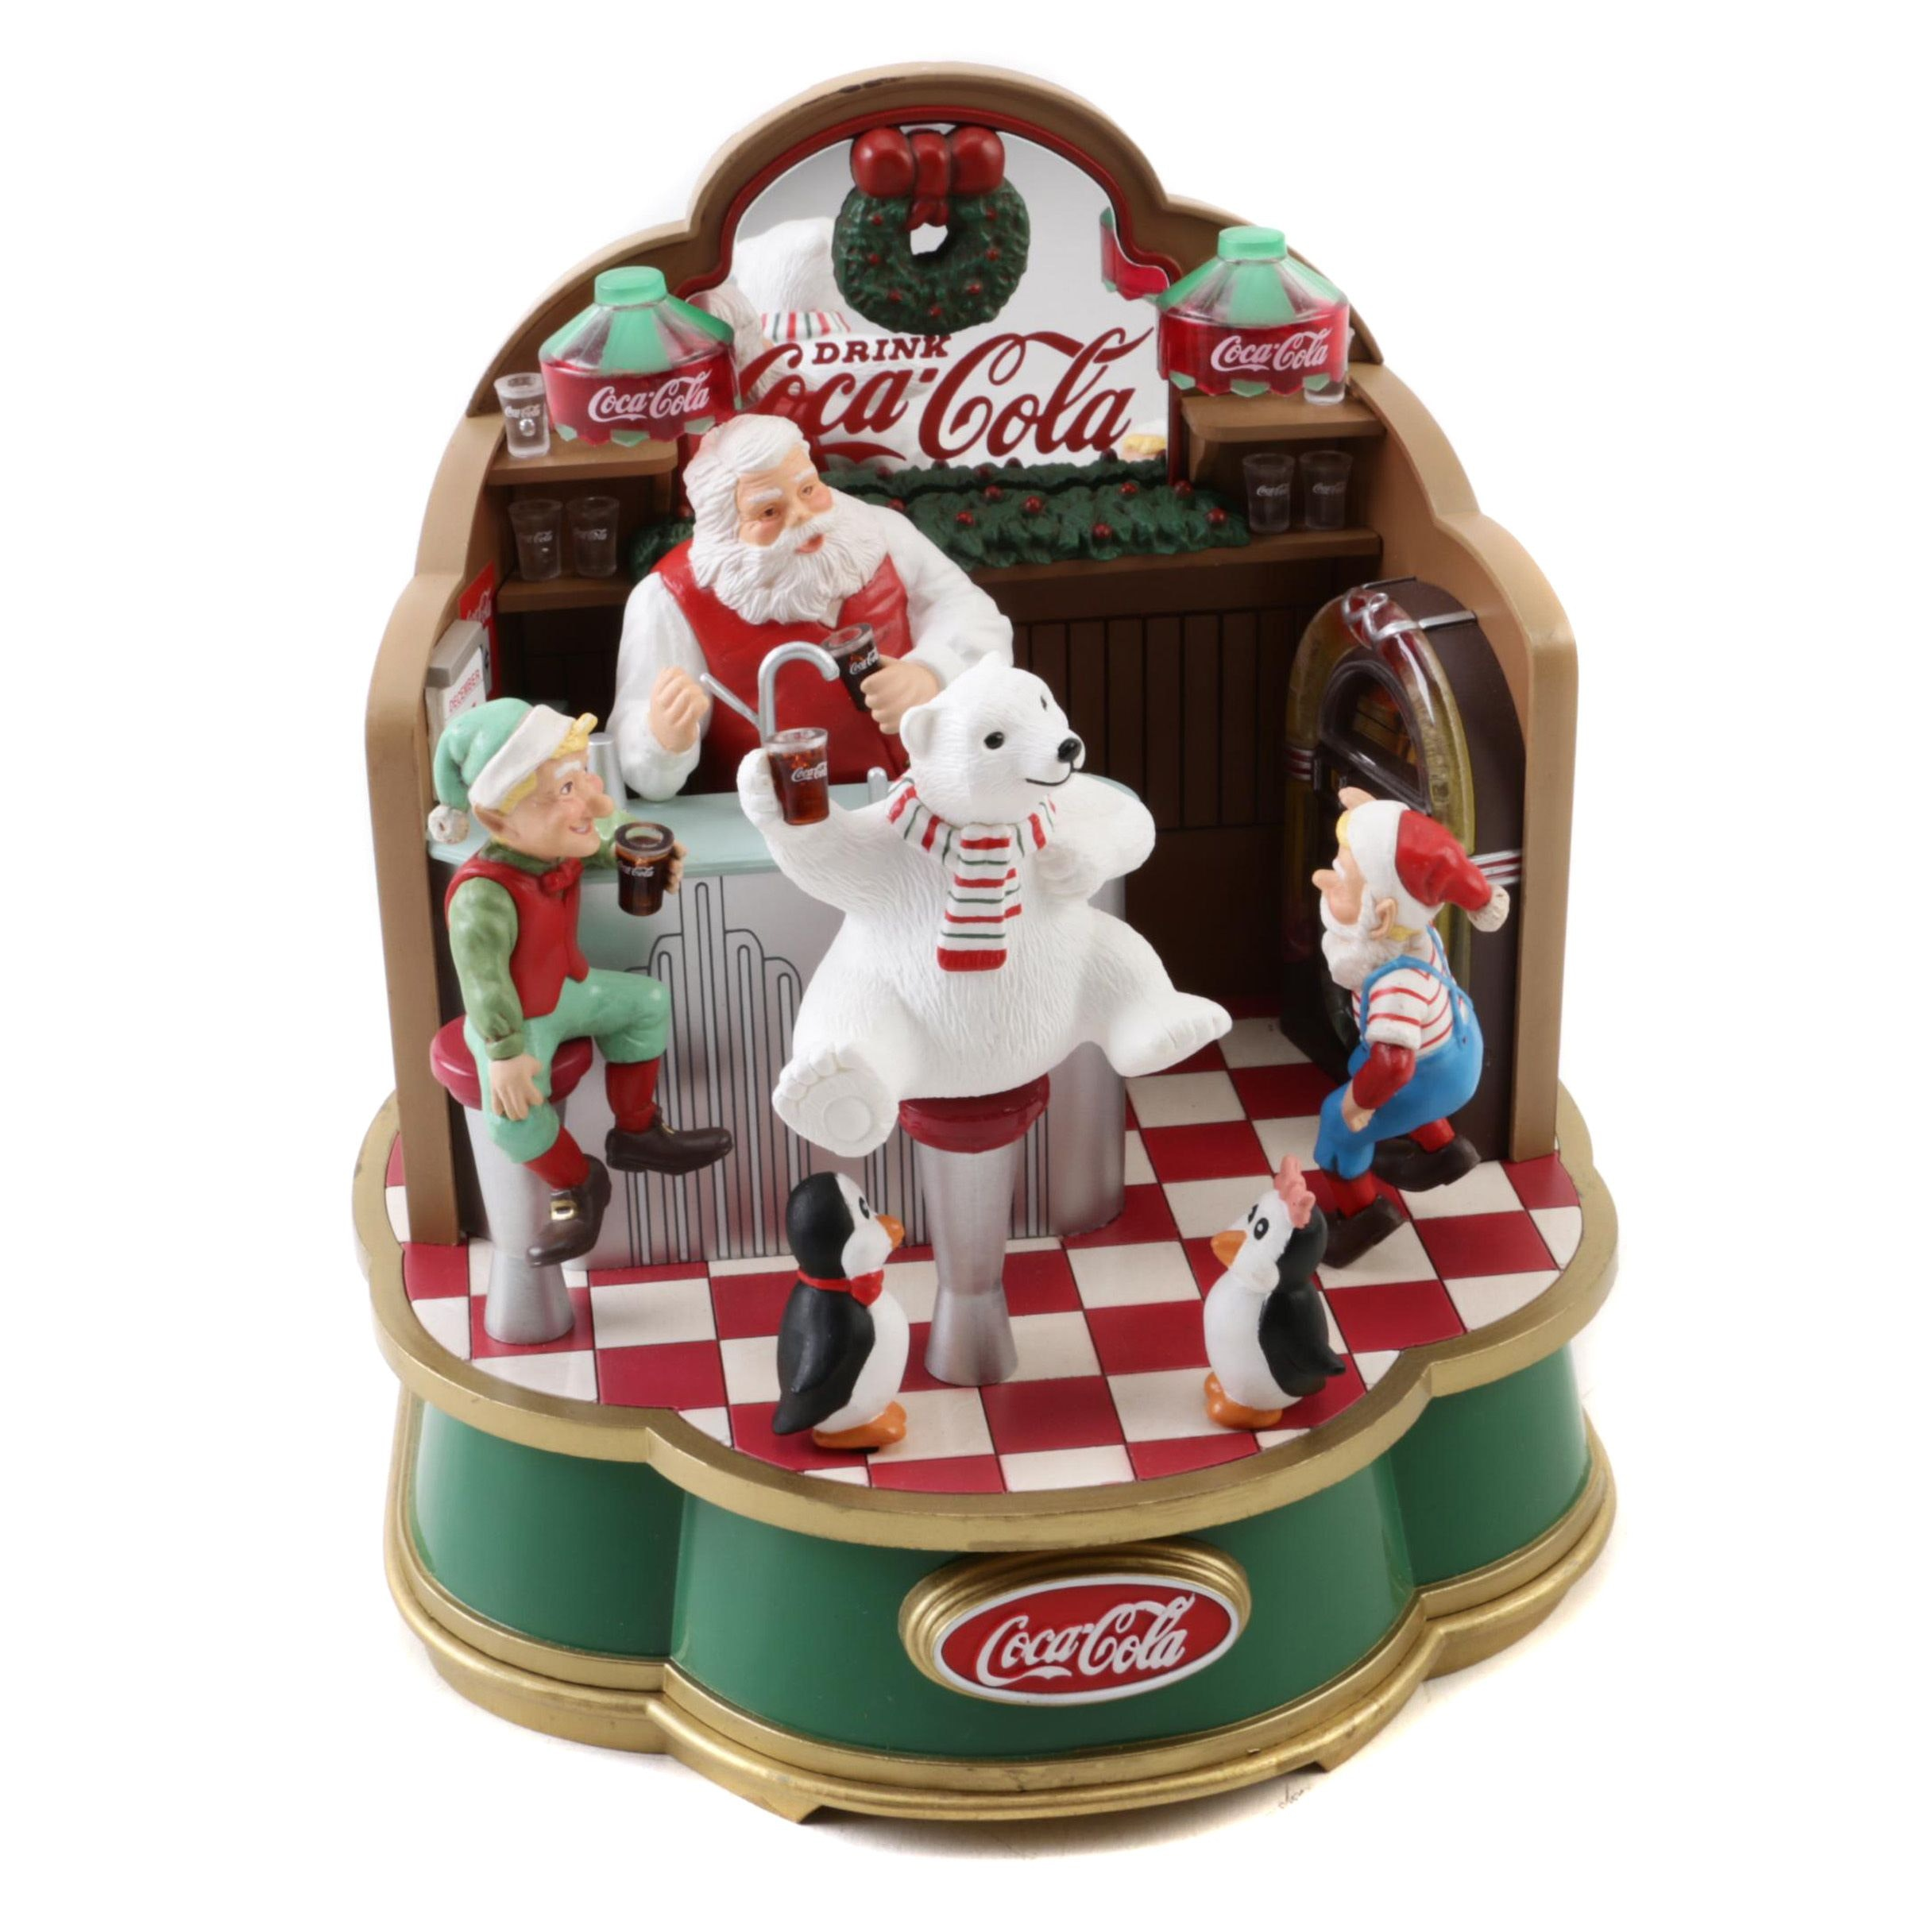 1994 Coca-Cola Collectible Music Box